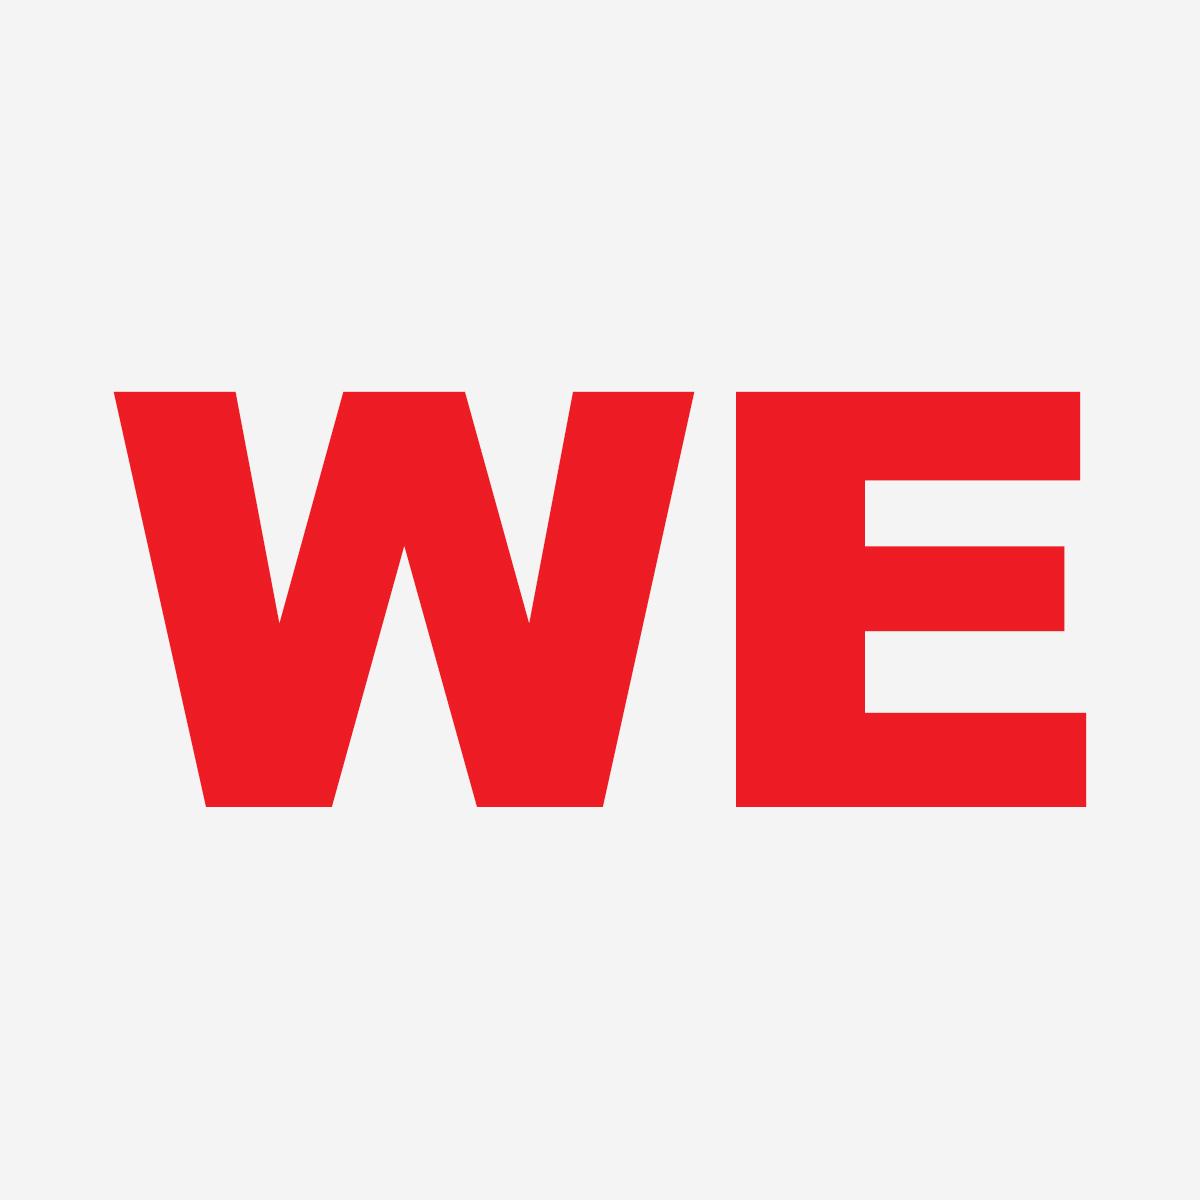 logo logo 标志 旗 旗帜 旗子 设计 矢量 矢量图 素材 图标 1200_1200